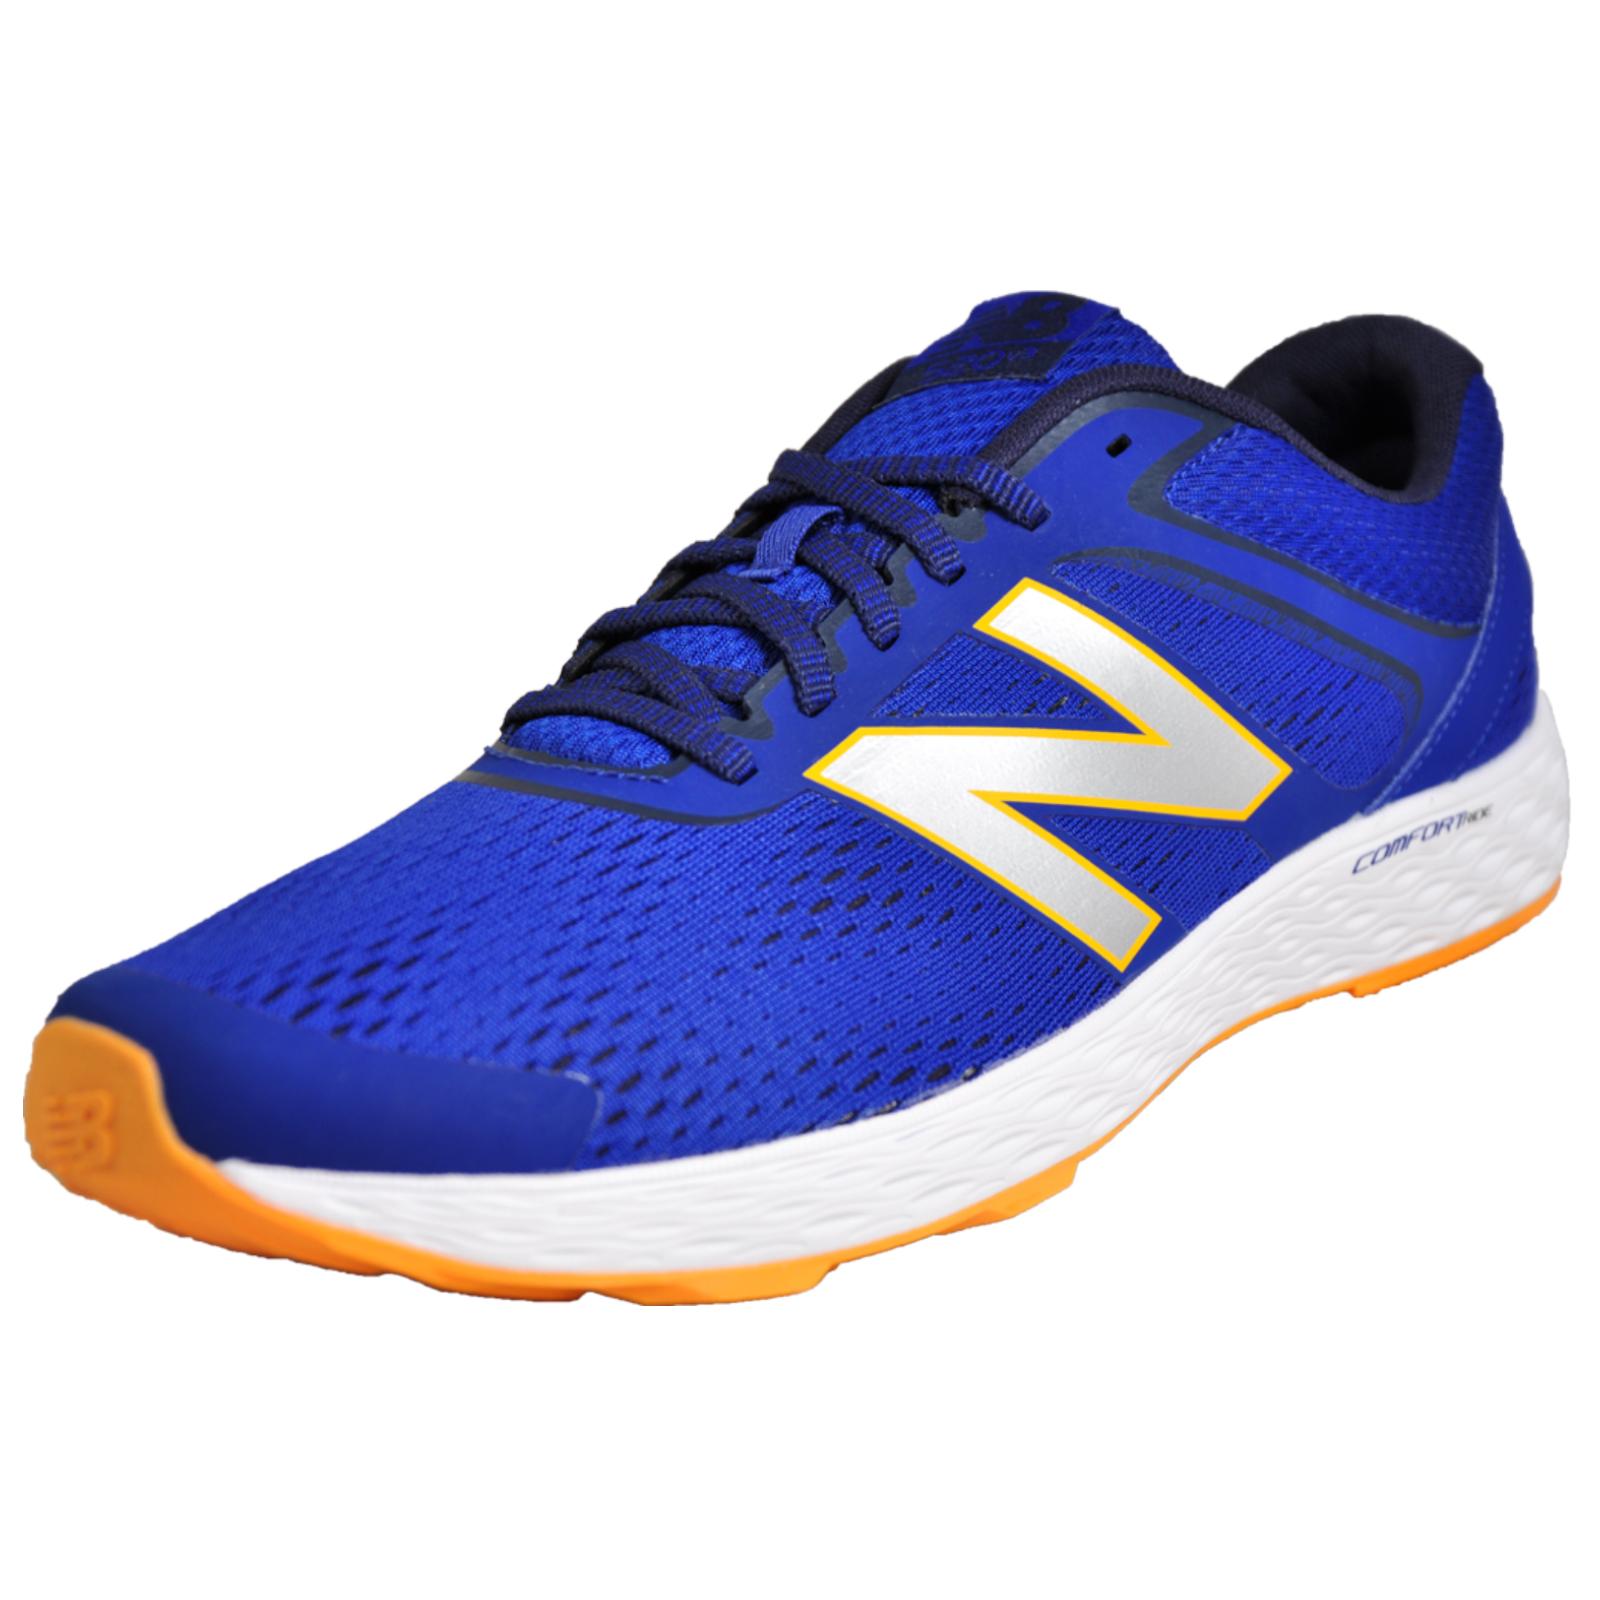 ea4cb7de3 New Balance 520 v3 Men s Running Shoes Fitness Gym Workout Trainers Blue